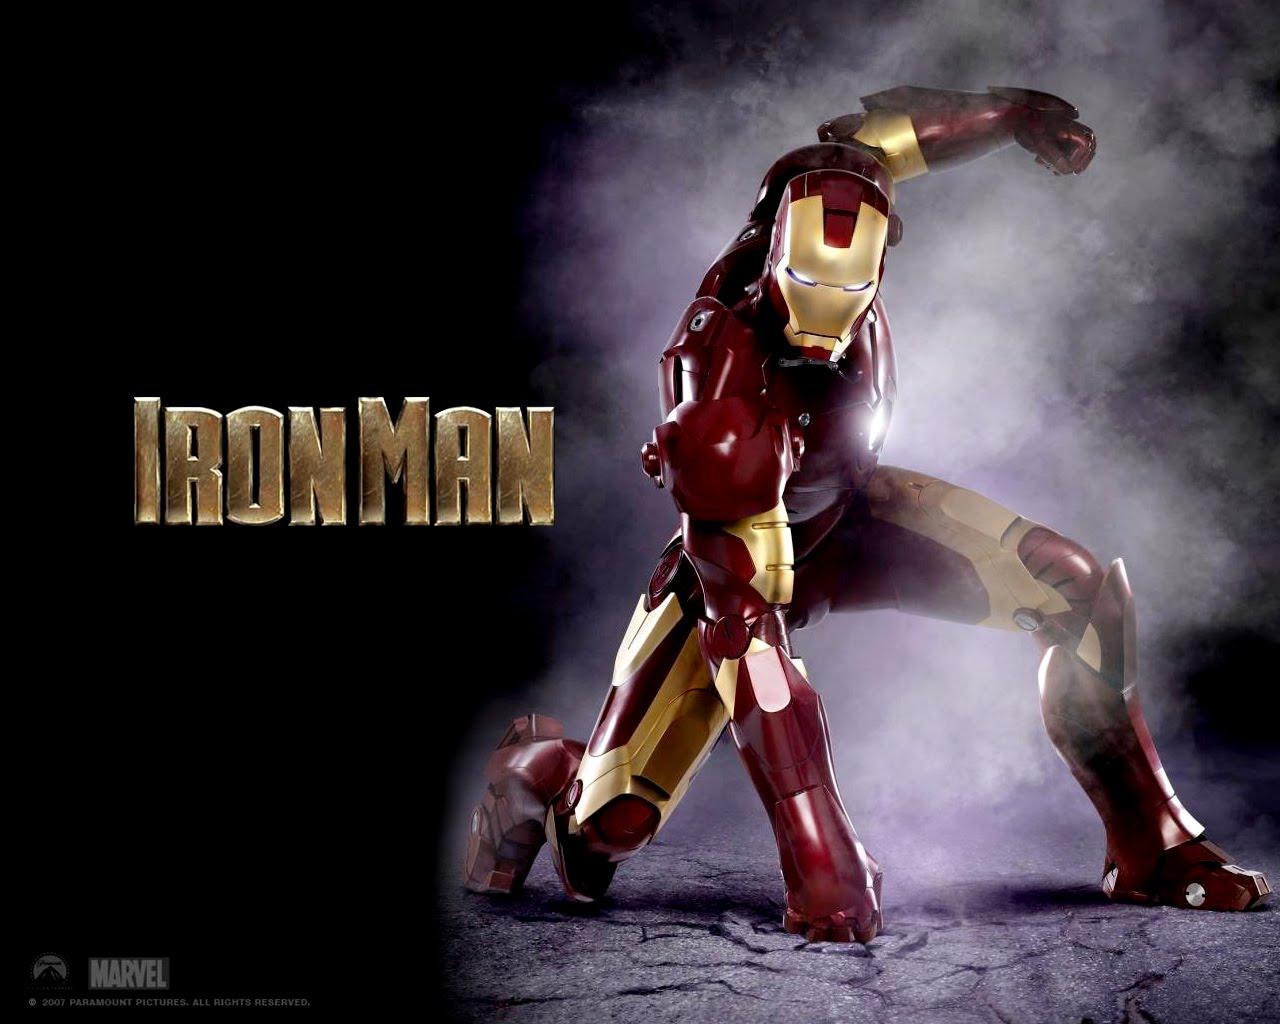 http://2.bp.blogspot.com/_xJKvO3-ujLM/S-a_00zKXaI/AAAAAAAABe0/lyv-GEWMhDM/s1600/iron_man2.jpg